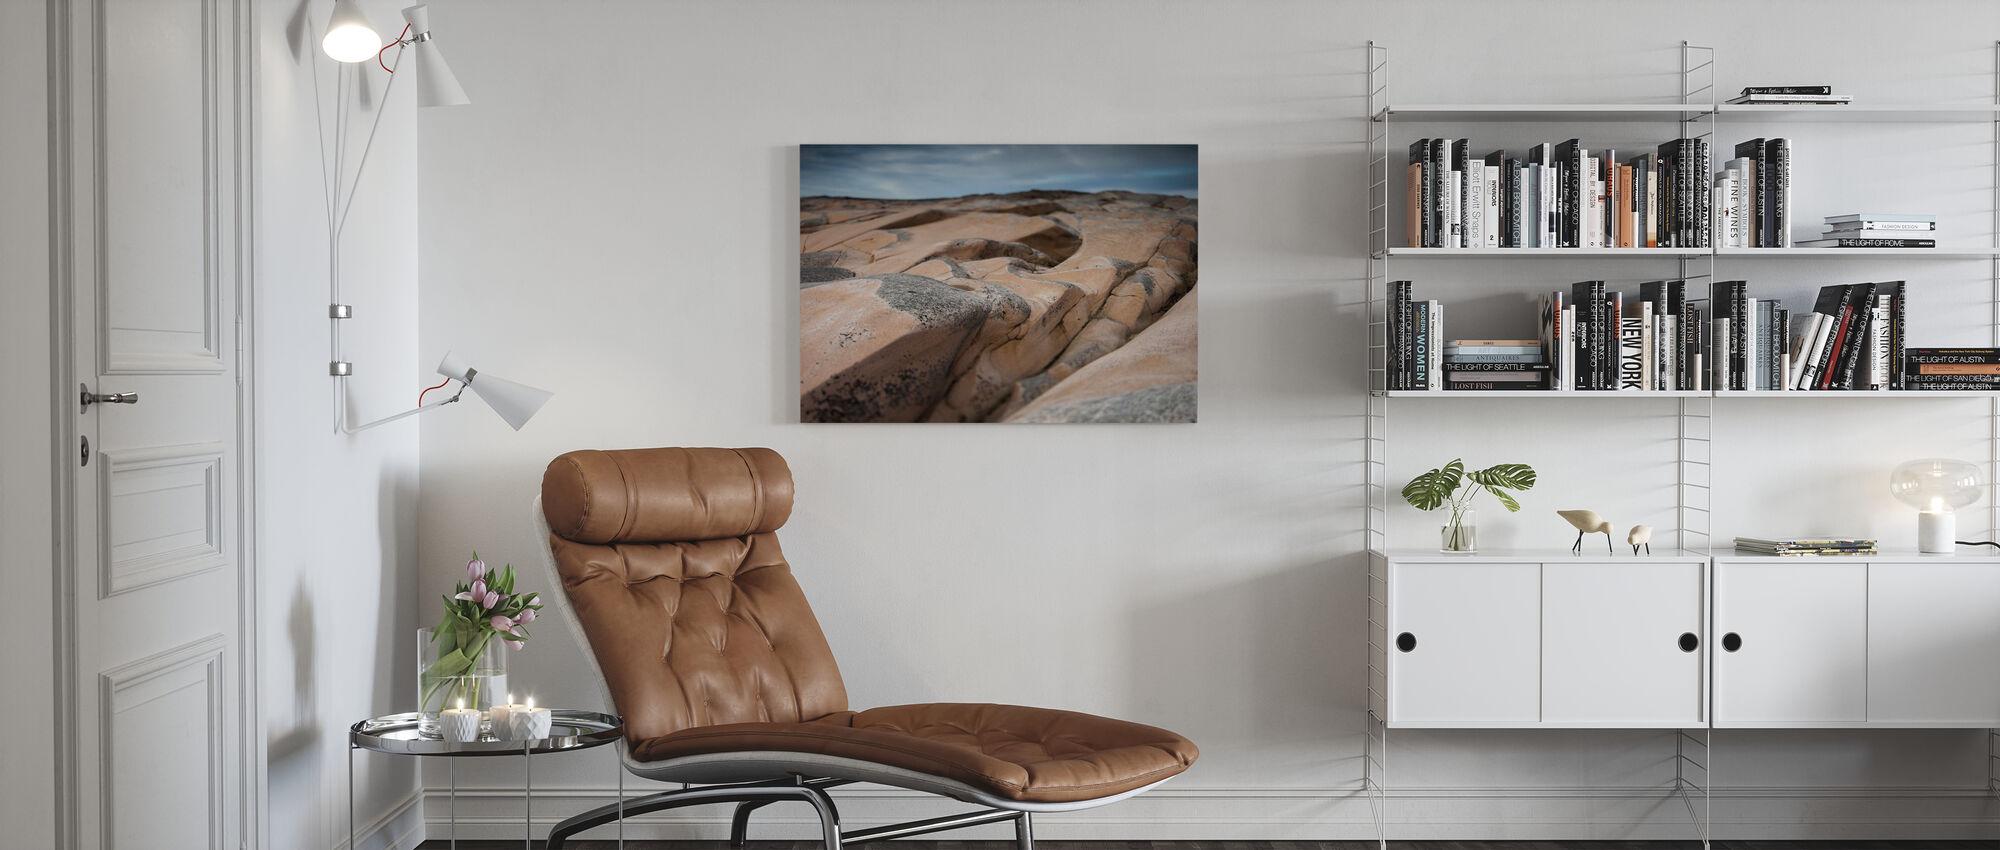 Mooie Formulieren - Canvas print - Woonkamer